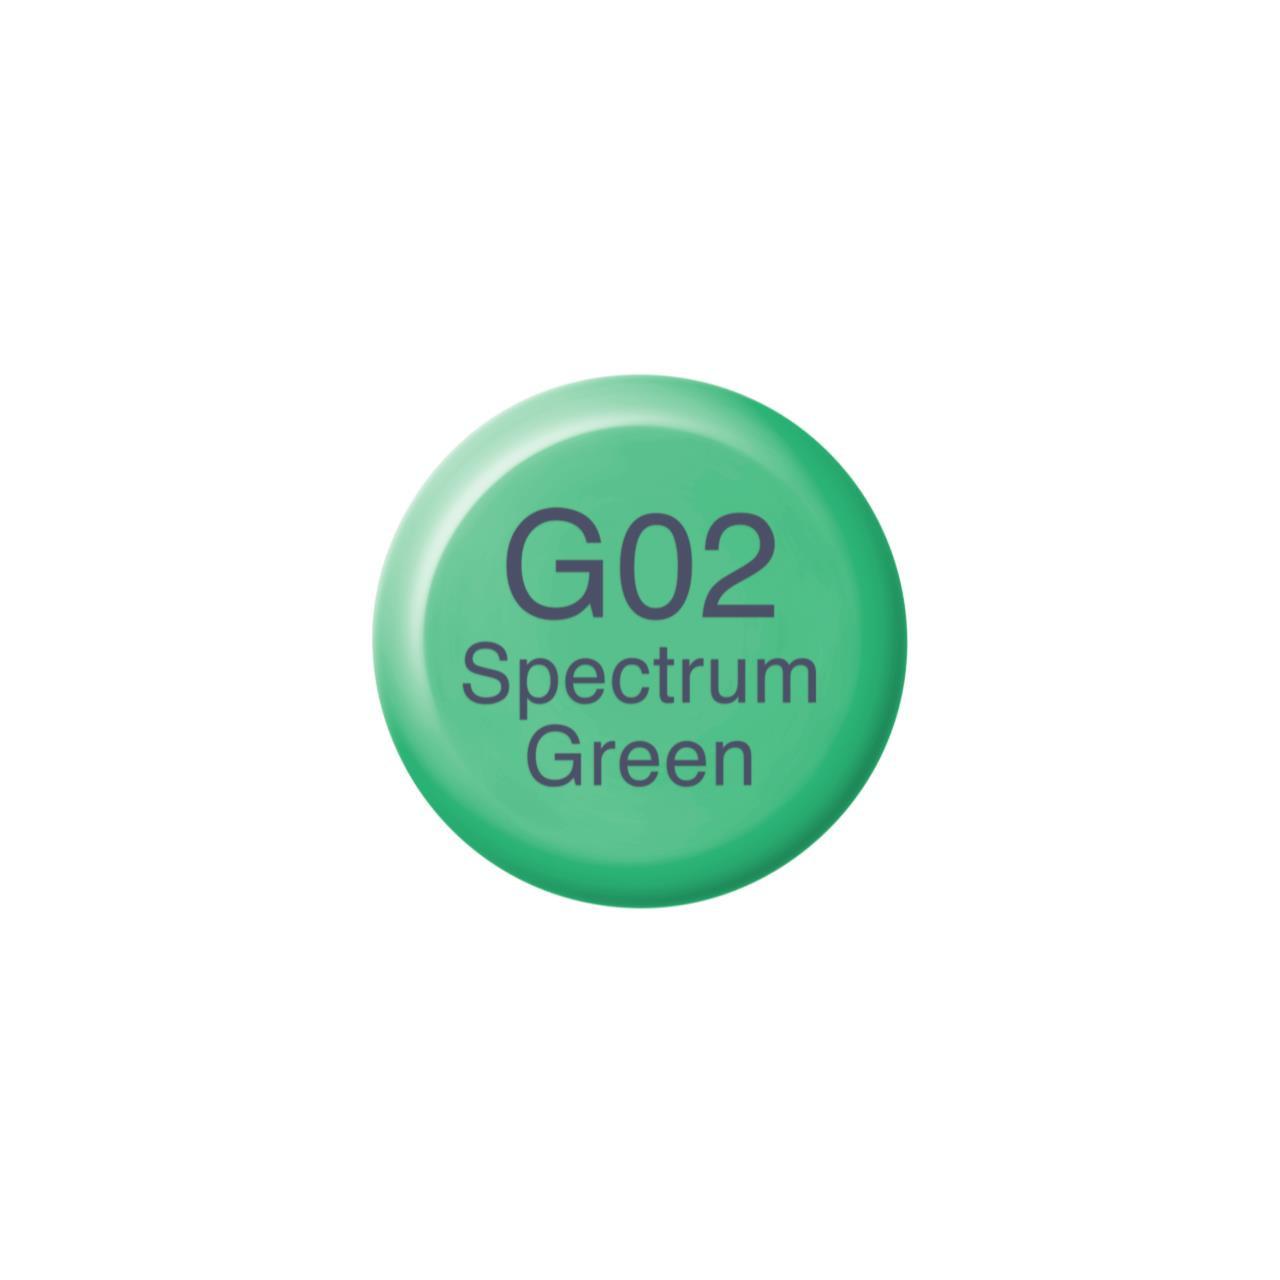 G02 Spectrum Green, Copic Ink - 4511338057148